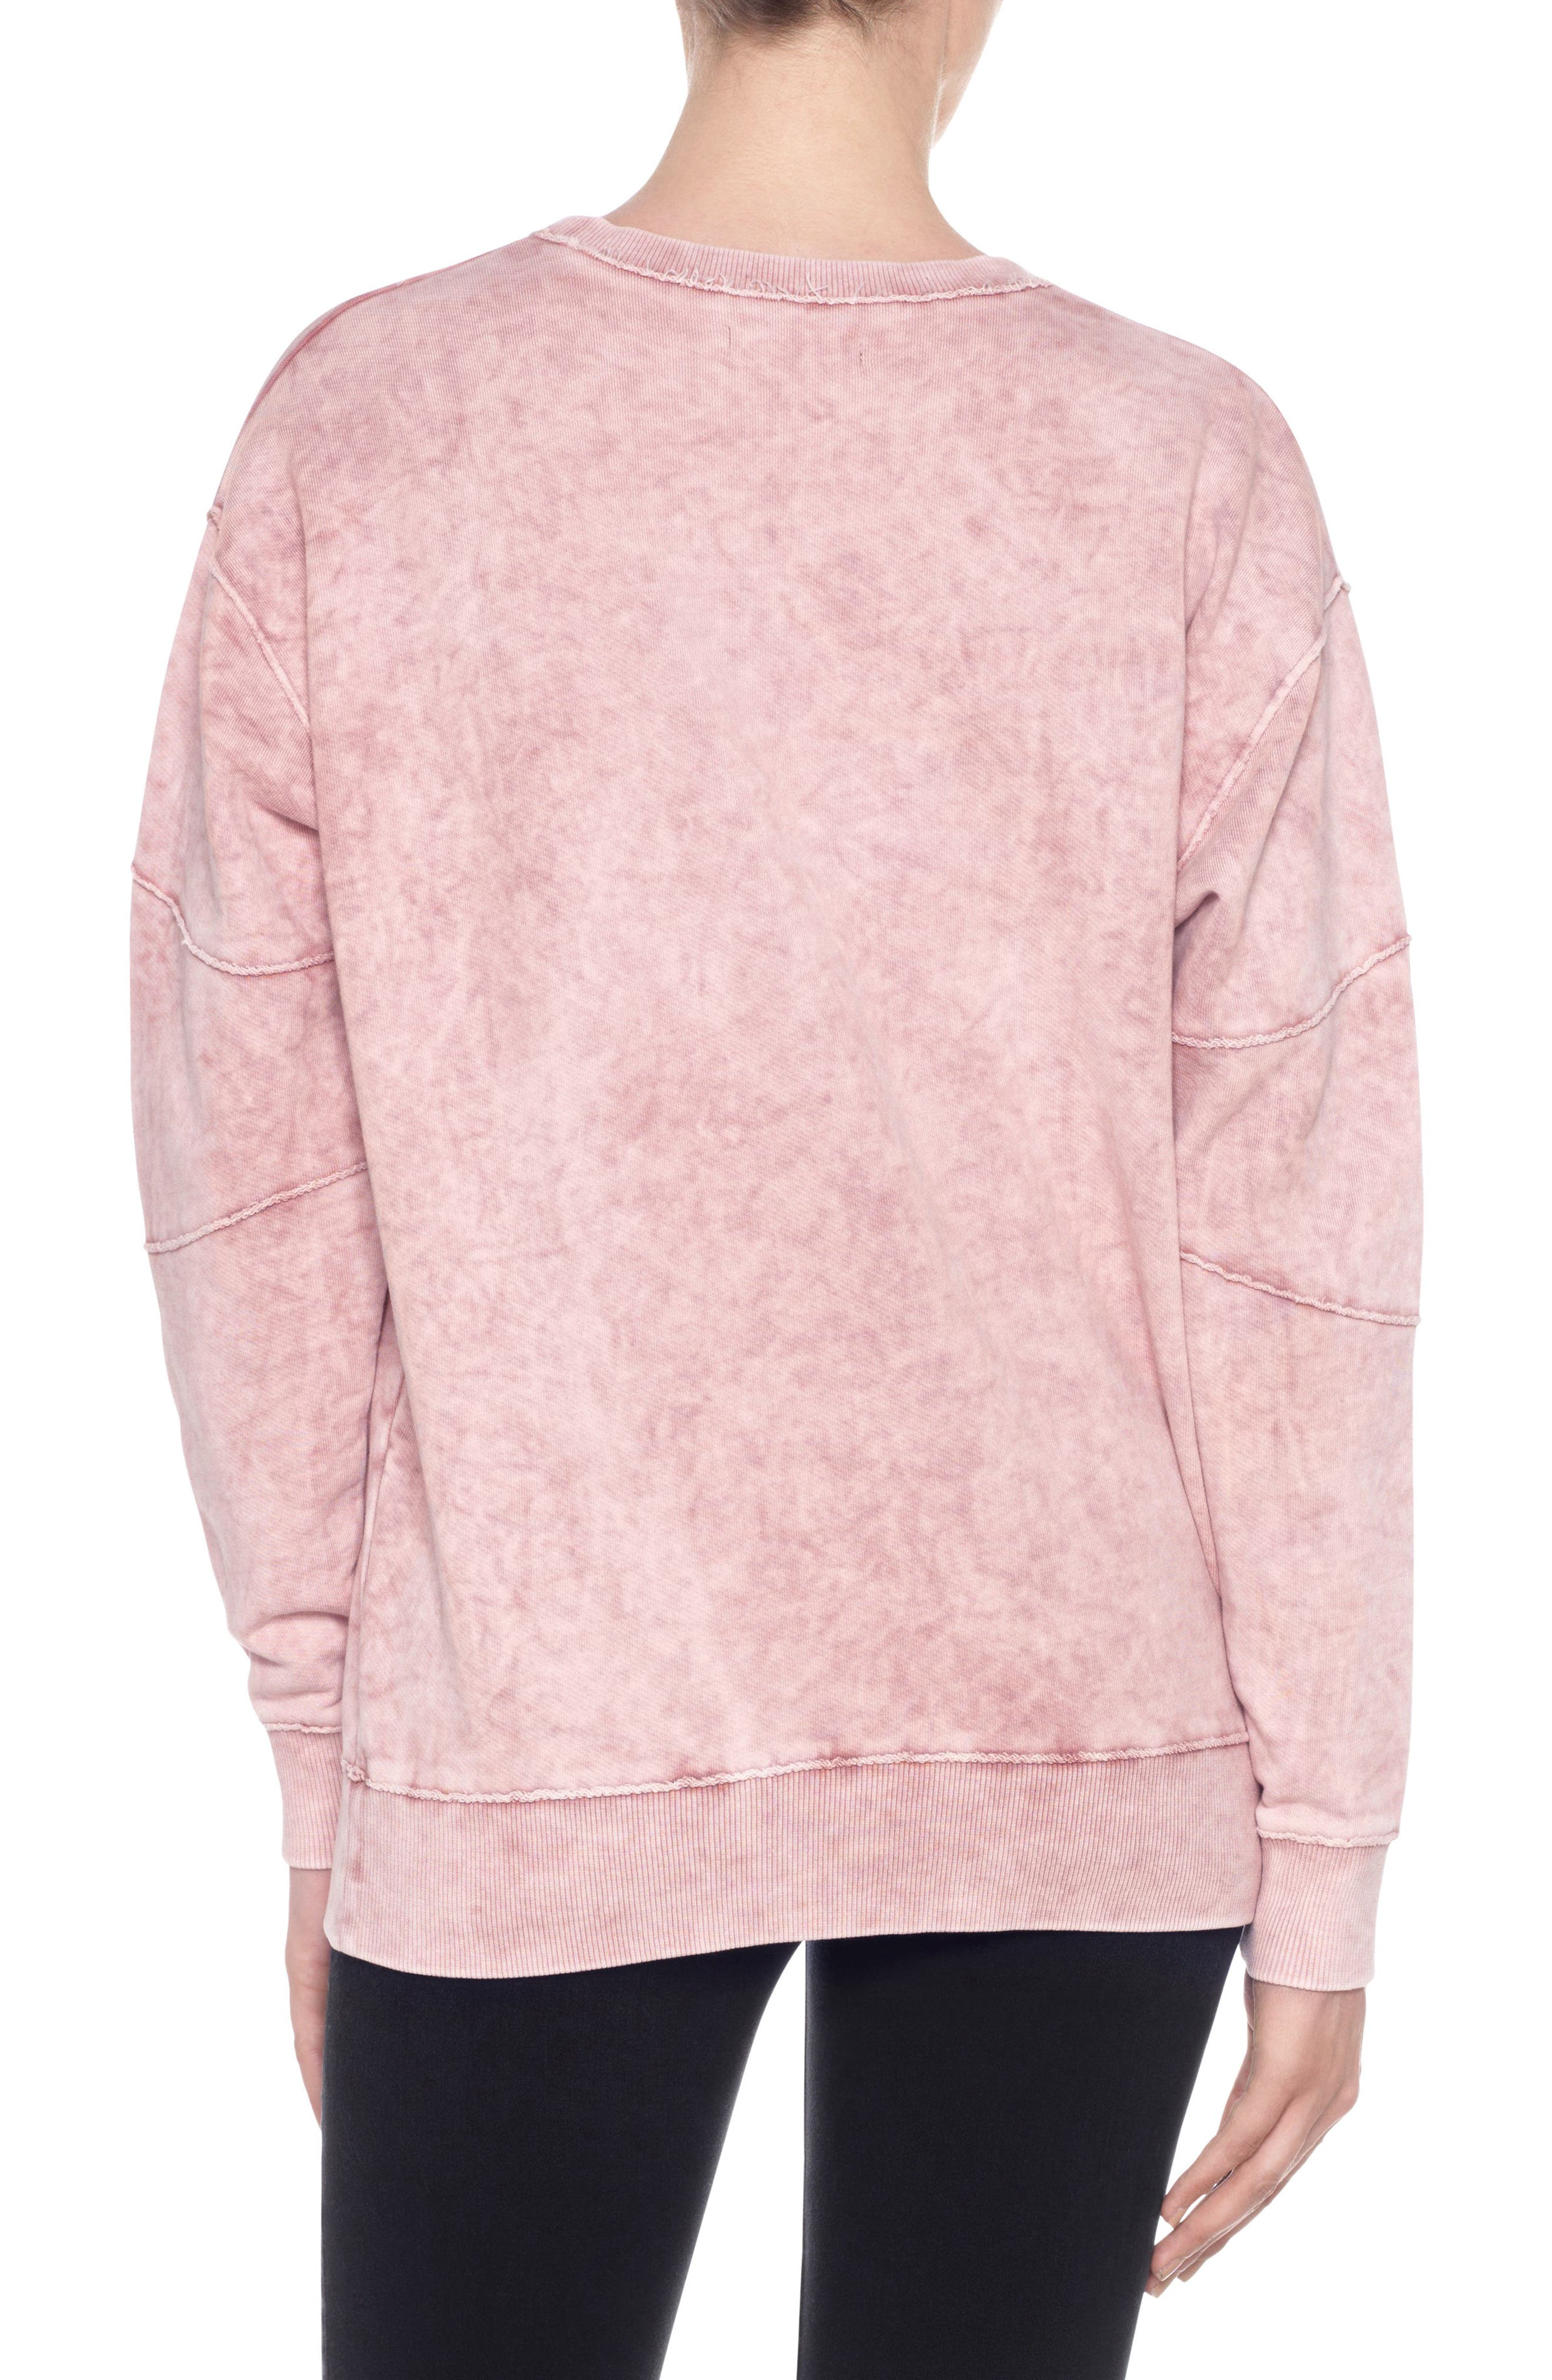 Kendall Sweatshirt,                             Alternate thumbnail 3, color,                             Wood Rose